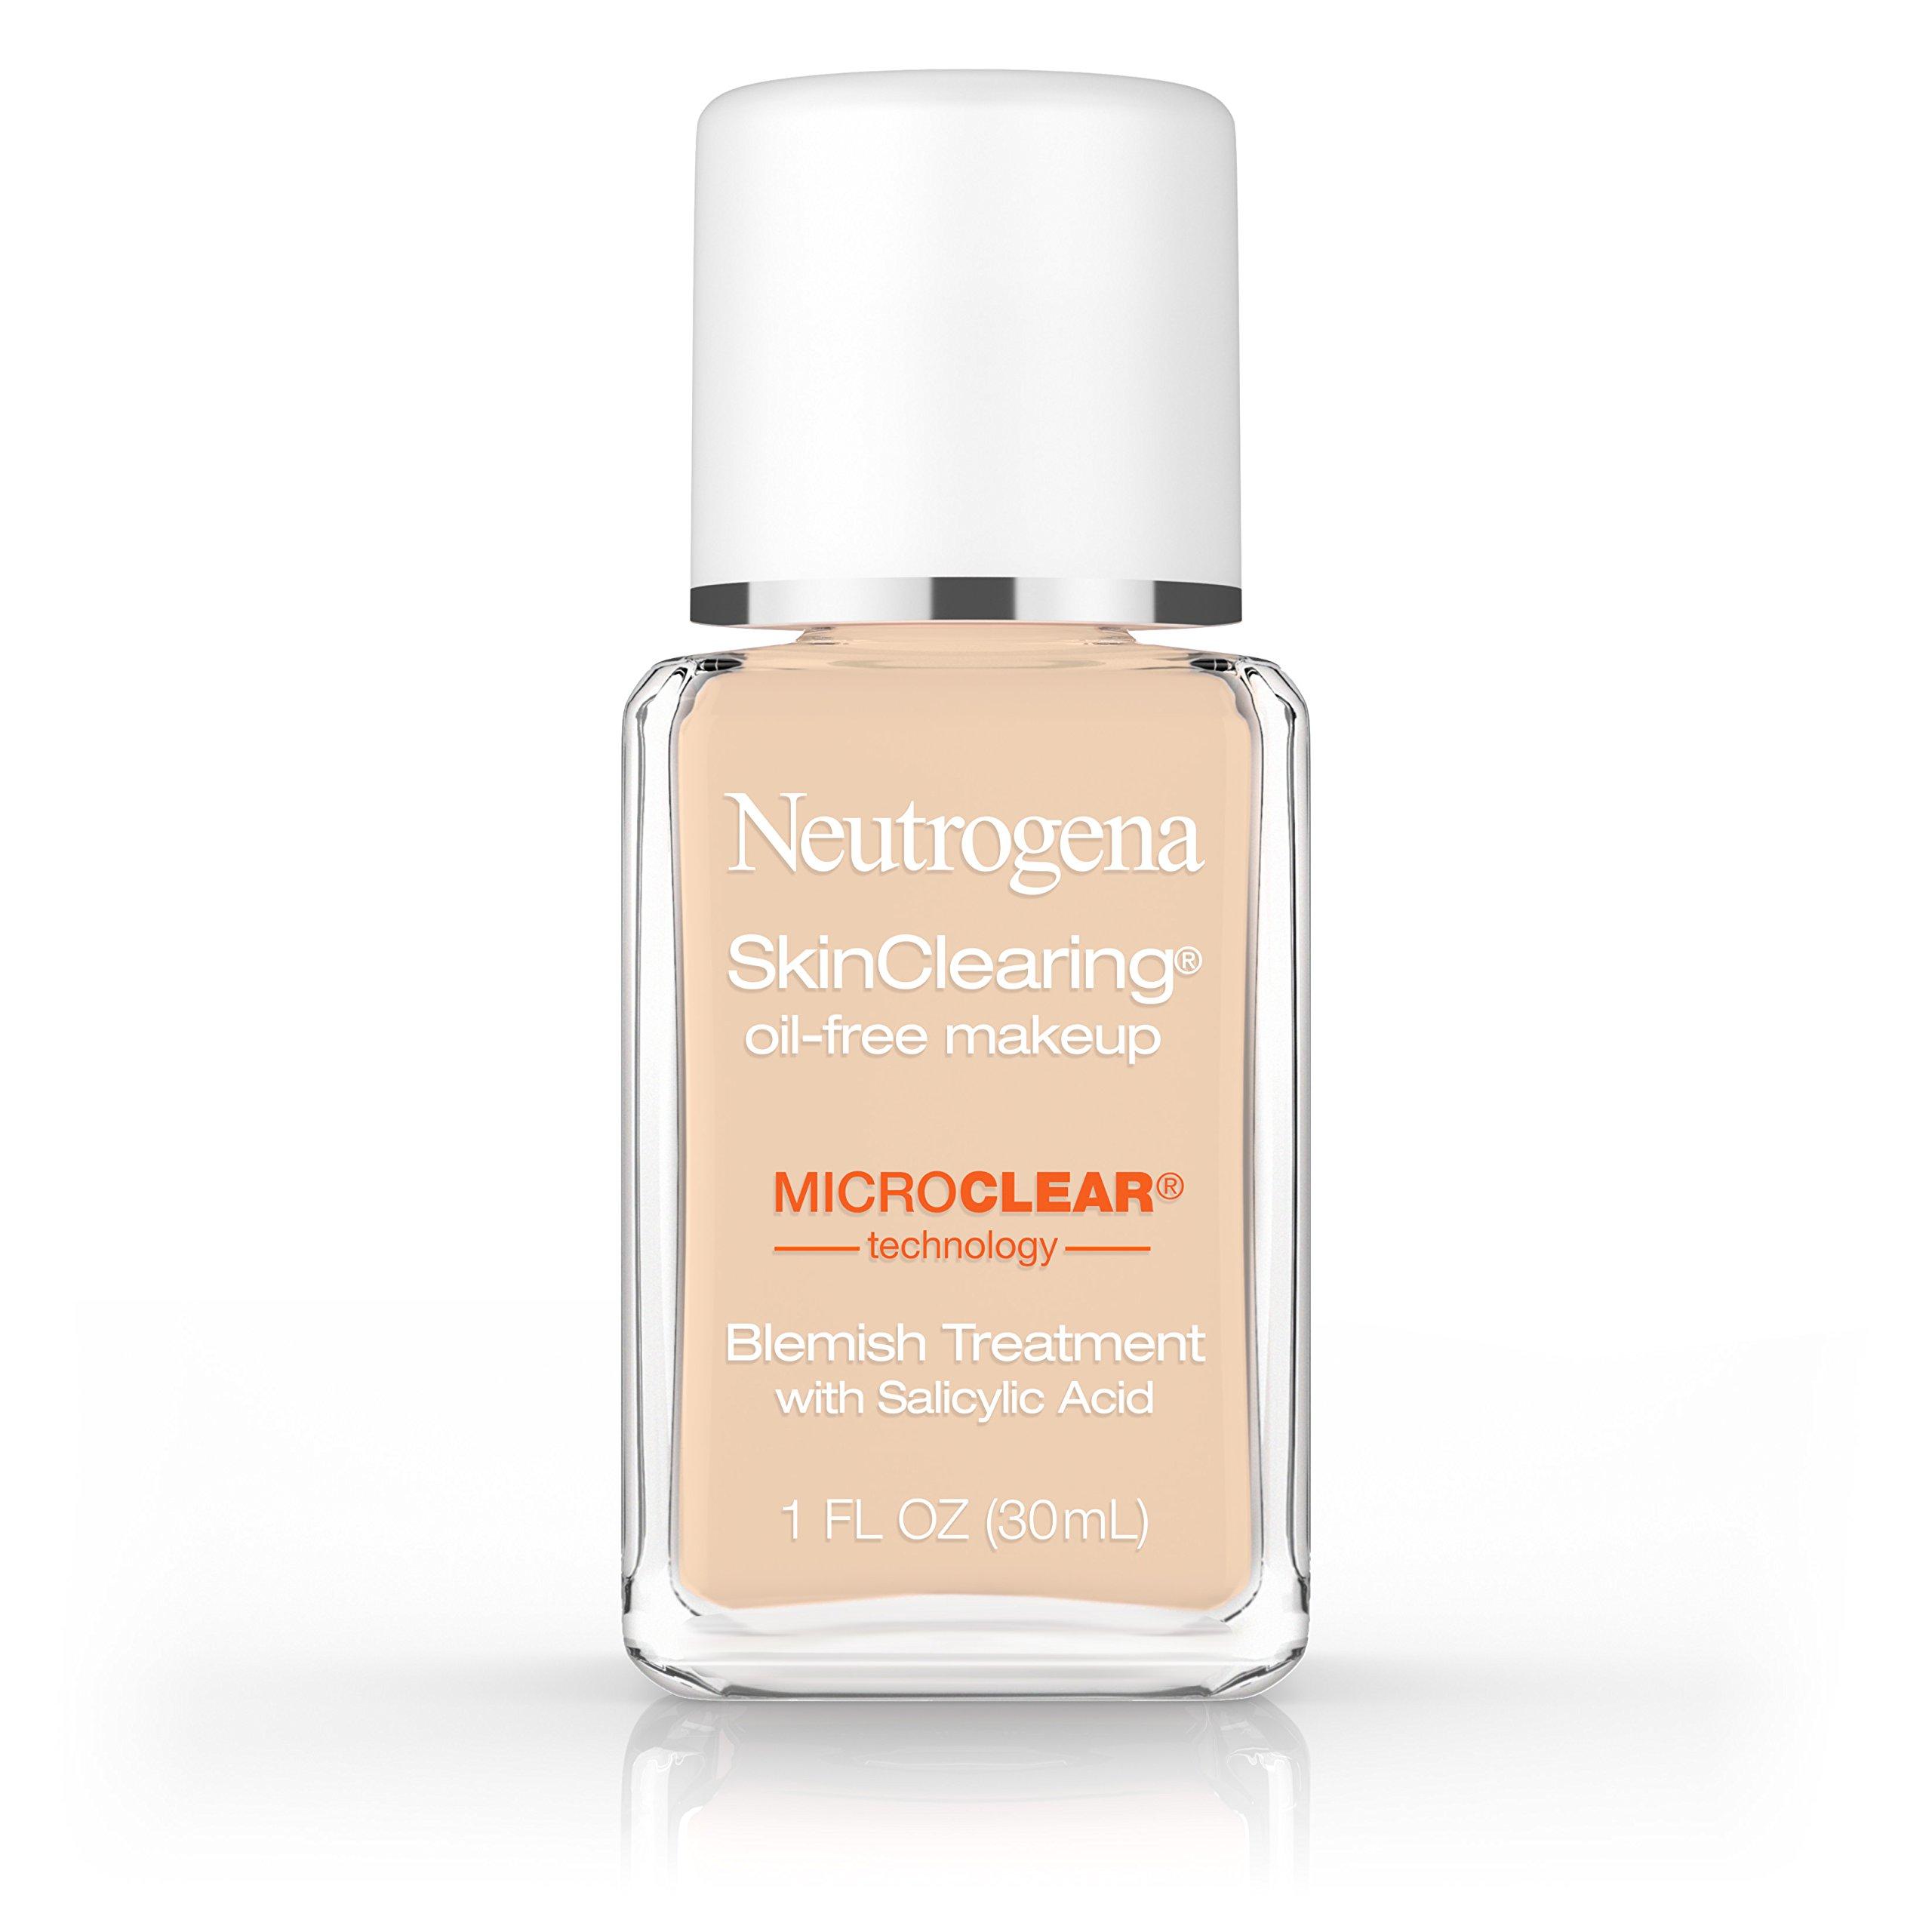 Neutrogena Skinclearing Makeup, 30 Buff, 1 Fl. Oz.